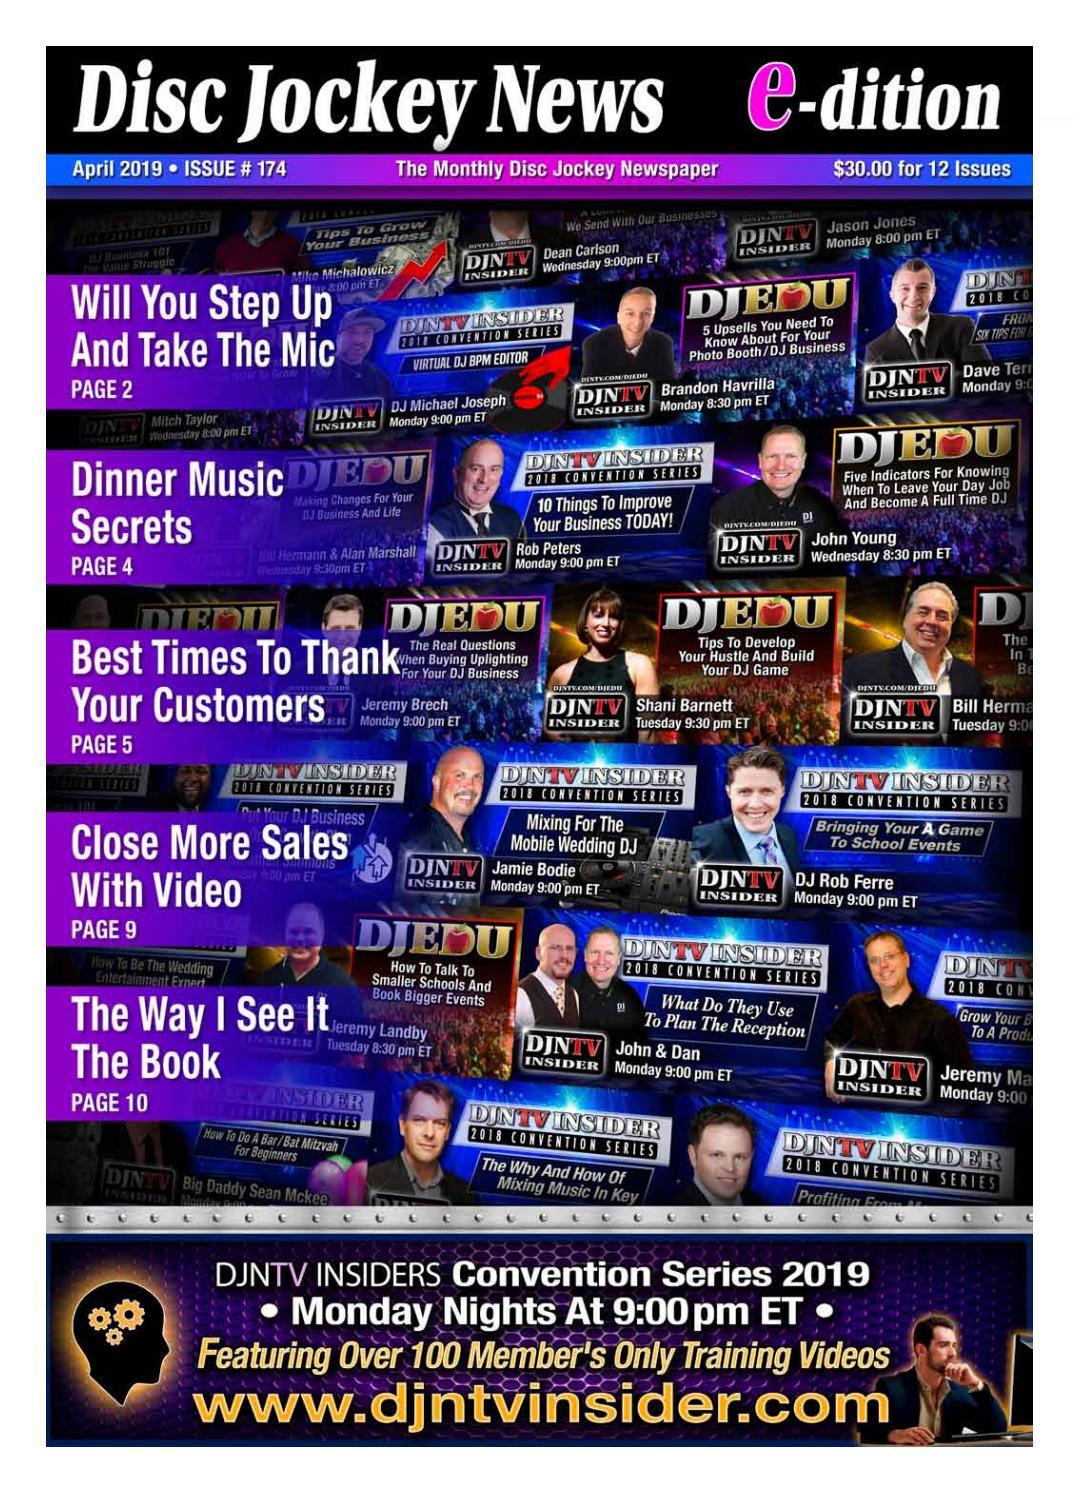 April 2019 Disc Jockey News by Disc Jockey News - issuu